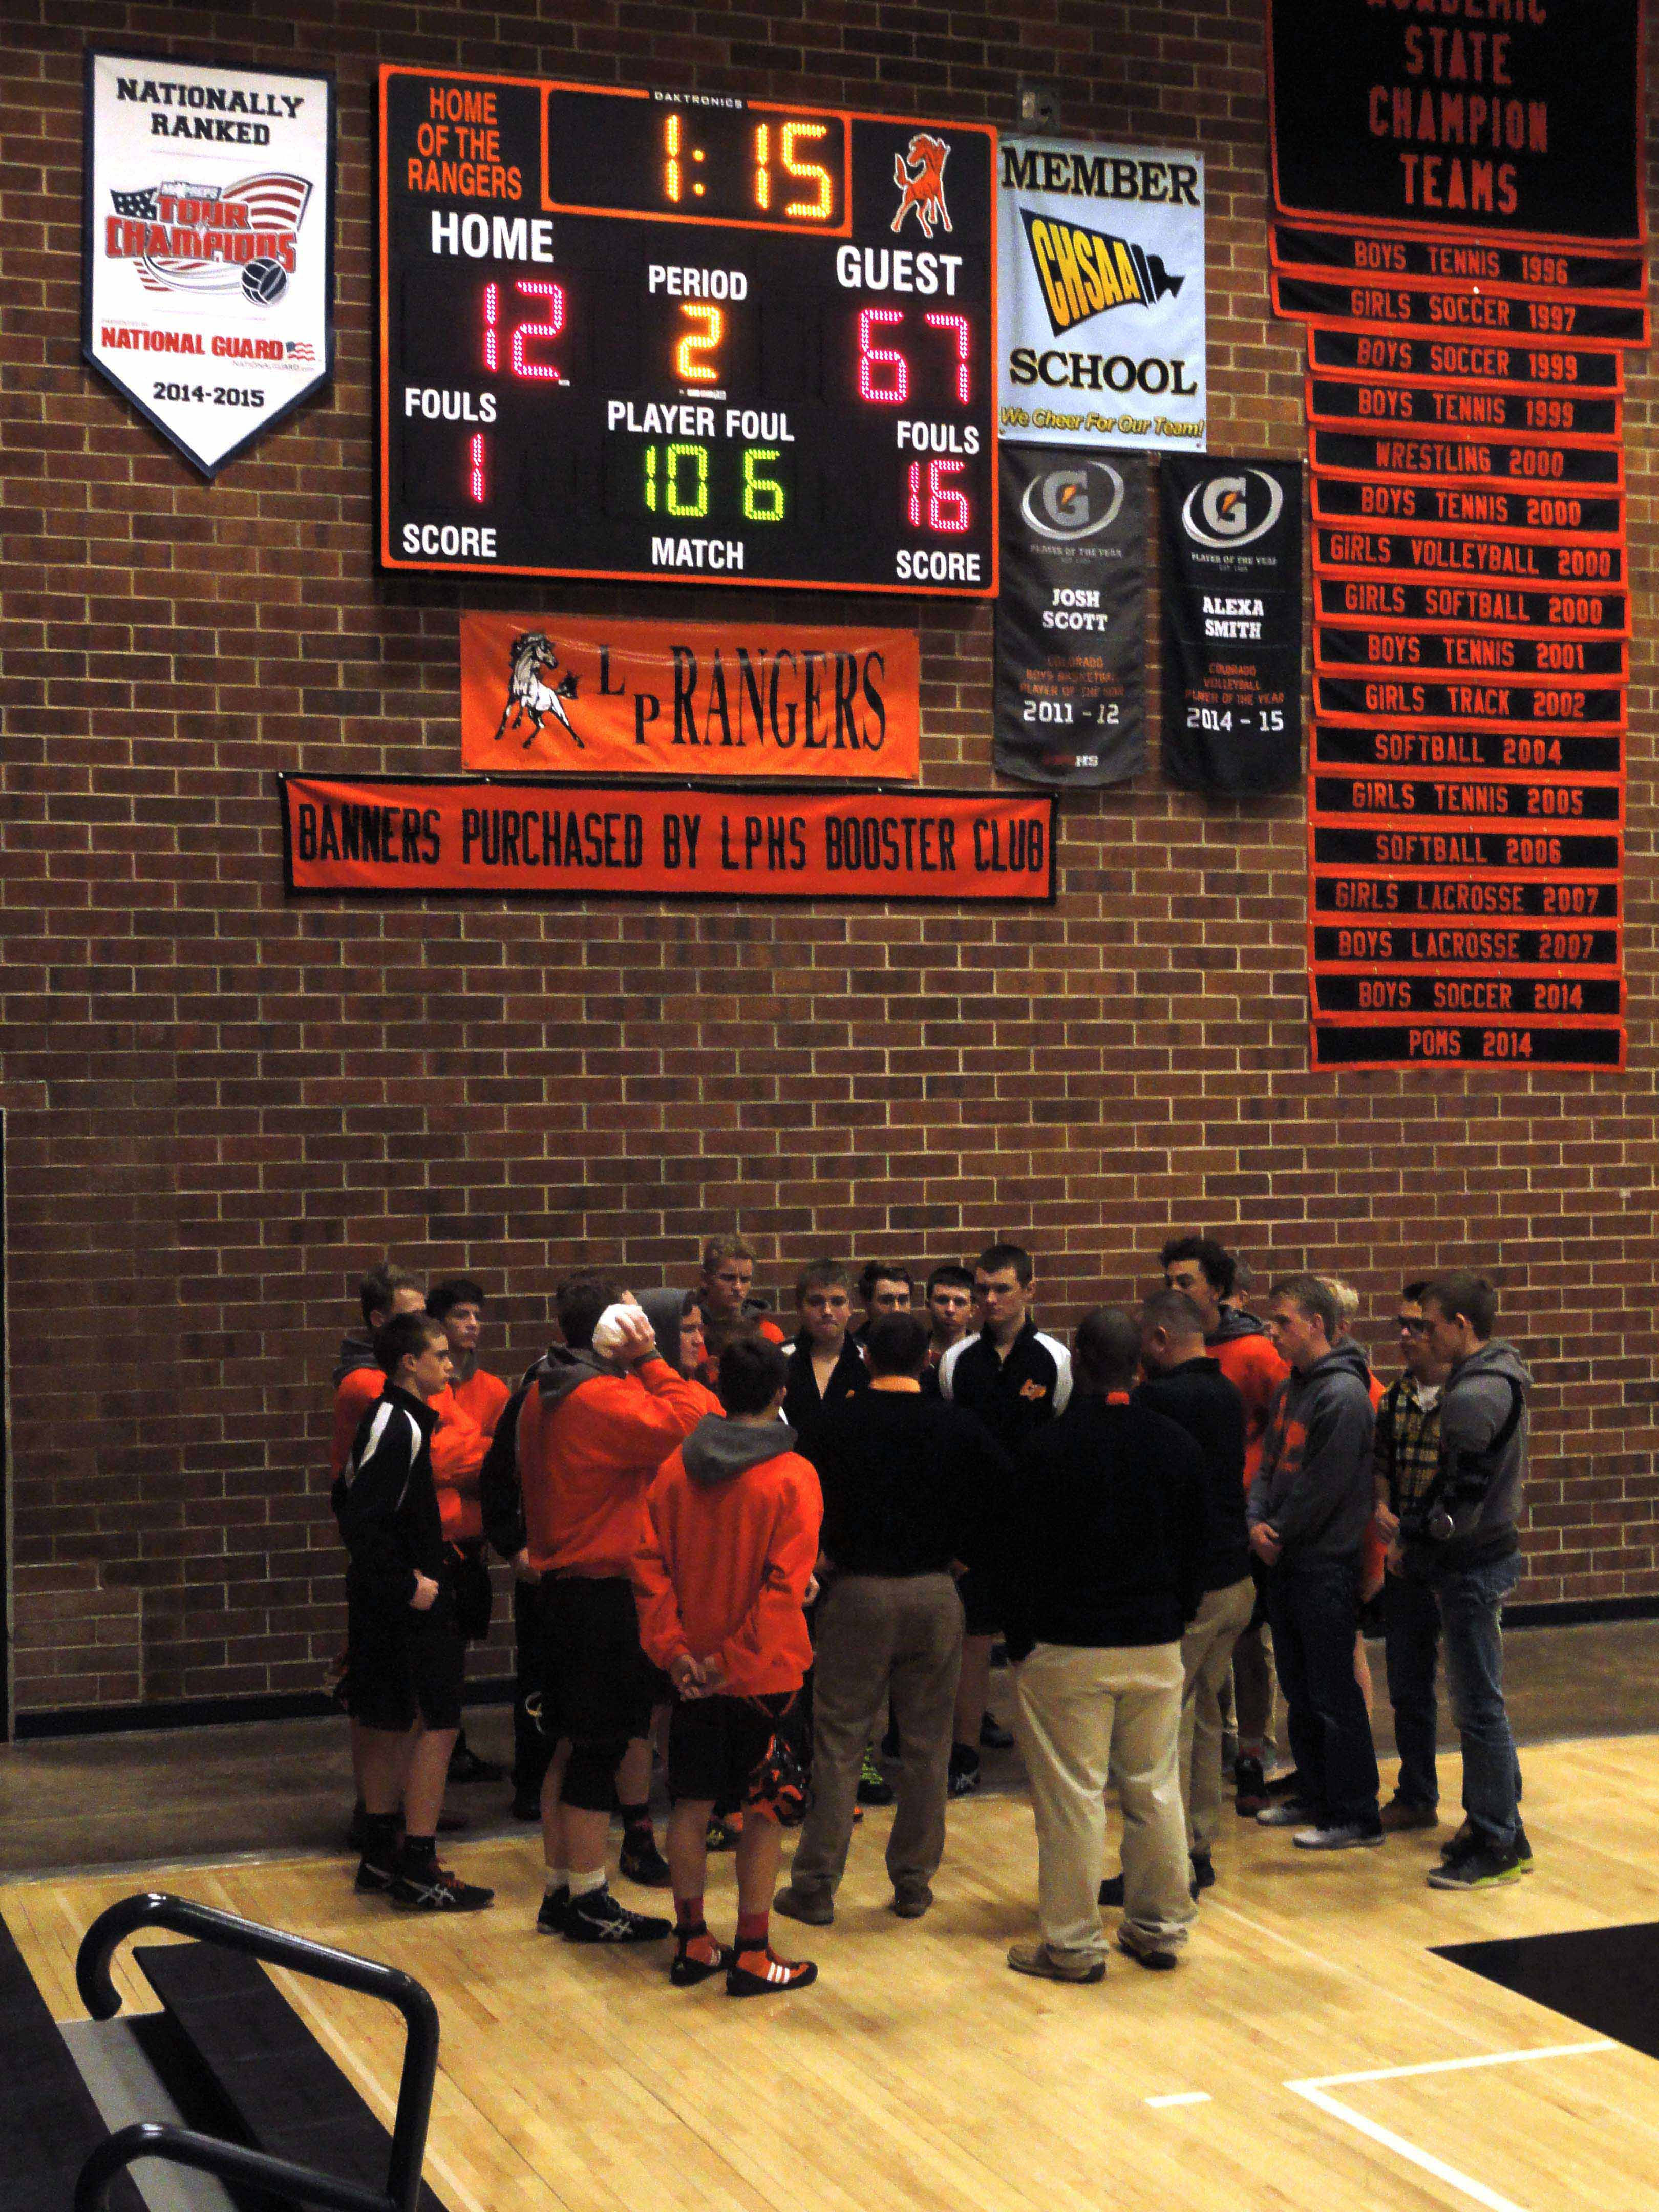 The team reconvenes under the scoreboard of Wednesday's duel